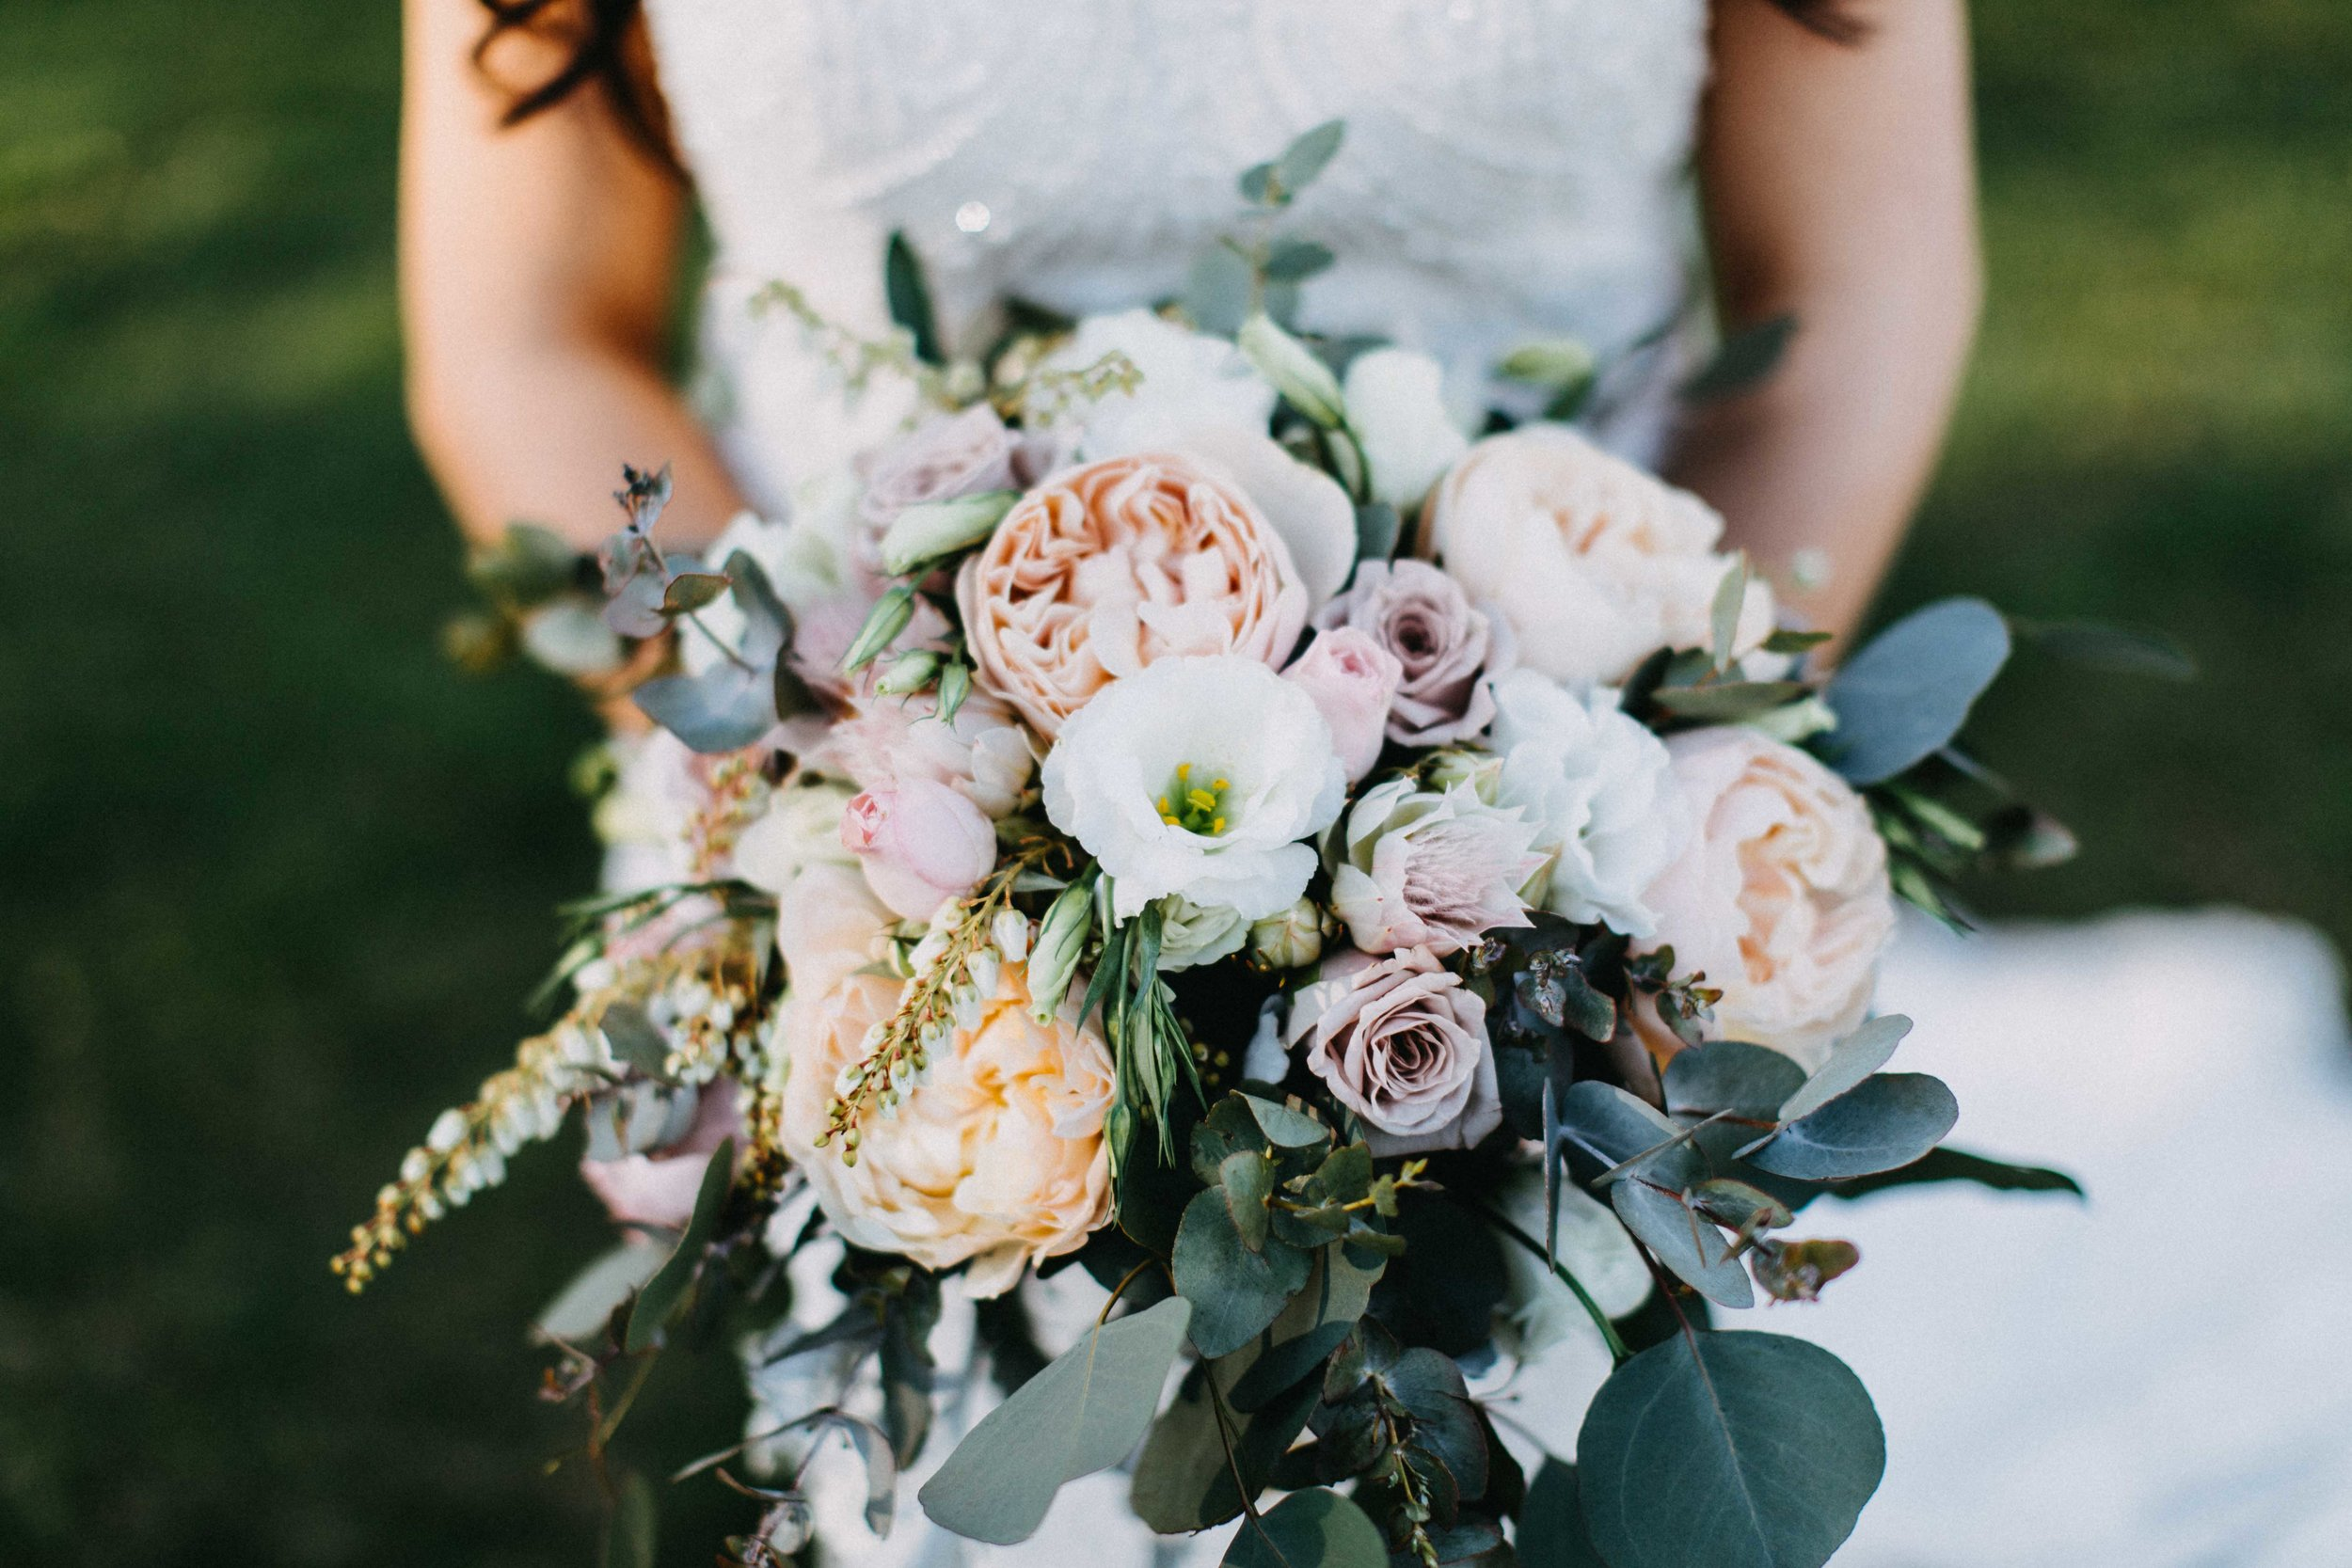 exeter-southern-highlands-wedding-www.emilyobrienphotography.net -80.jpg